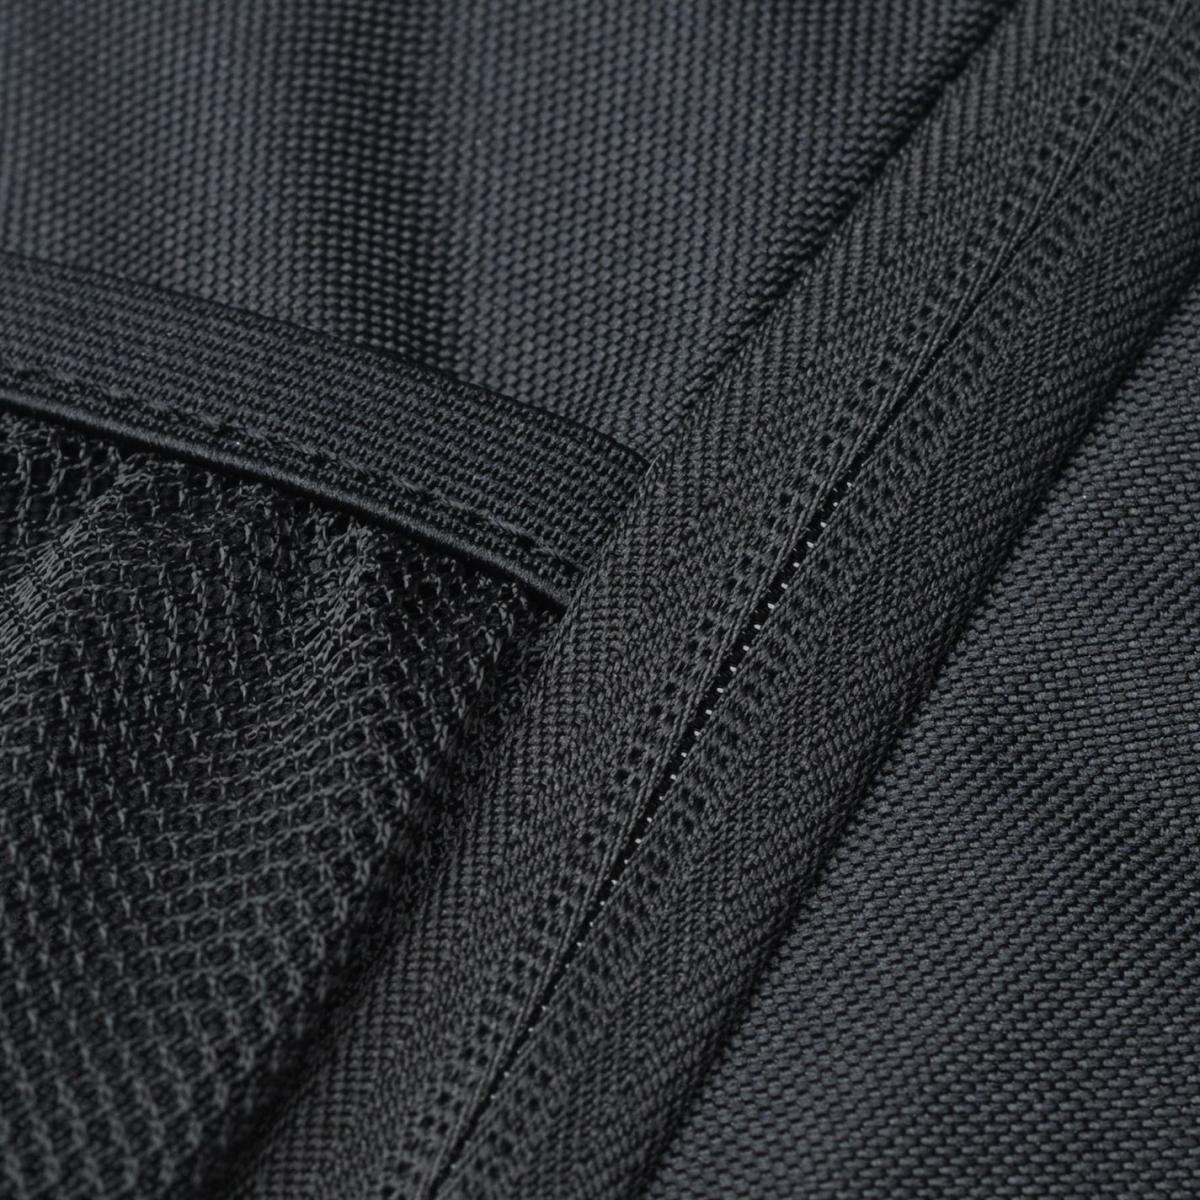 Nike Rucksack Schulrucksack Sport Reisen Wandern Backpack Damen Herren 1025